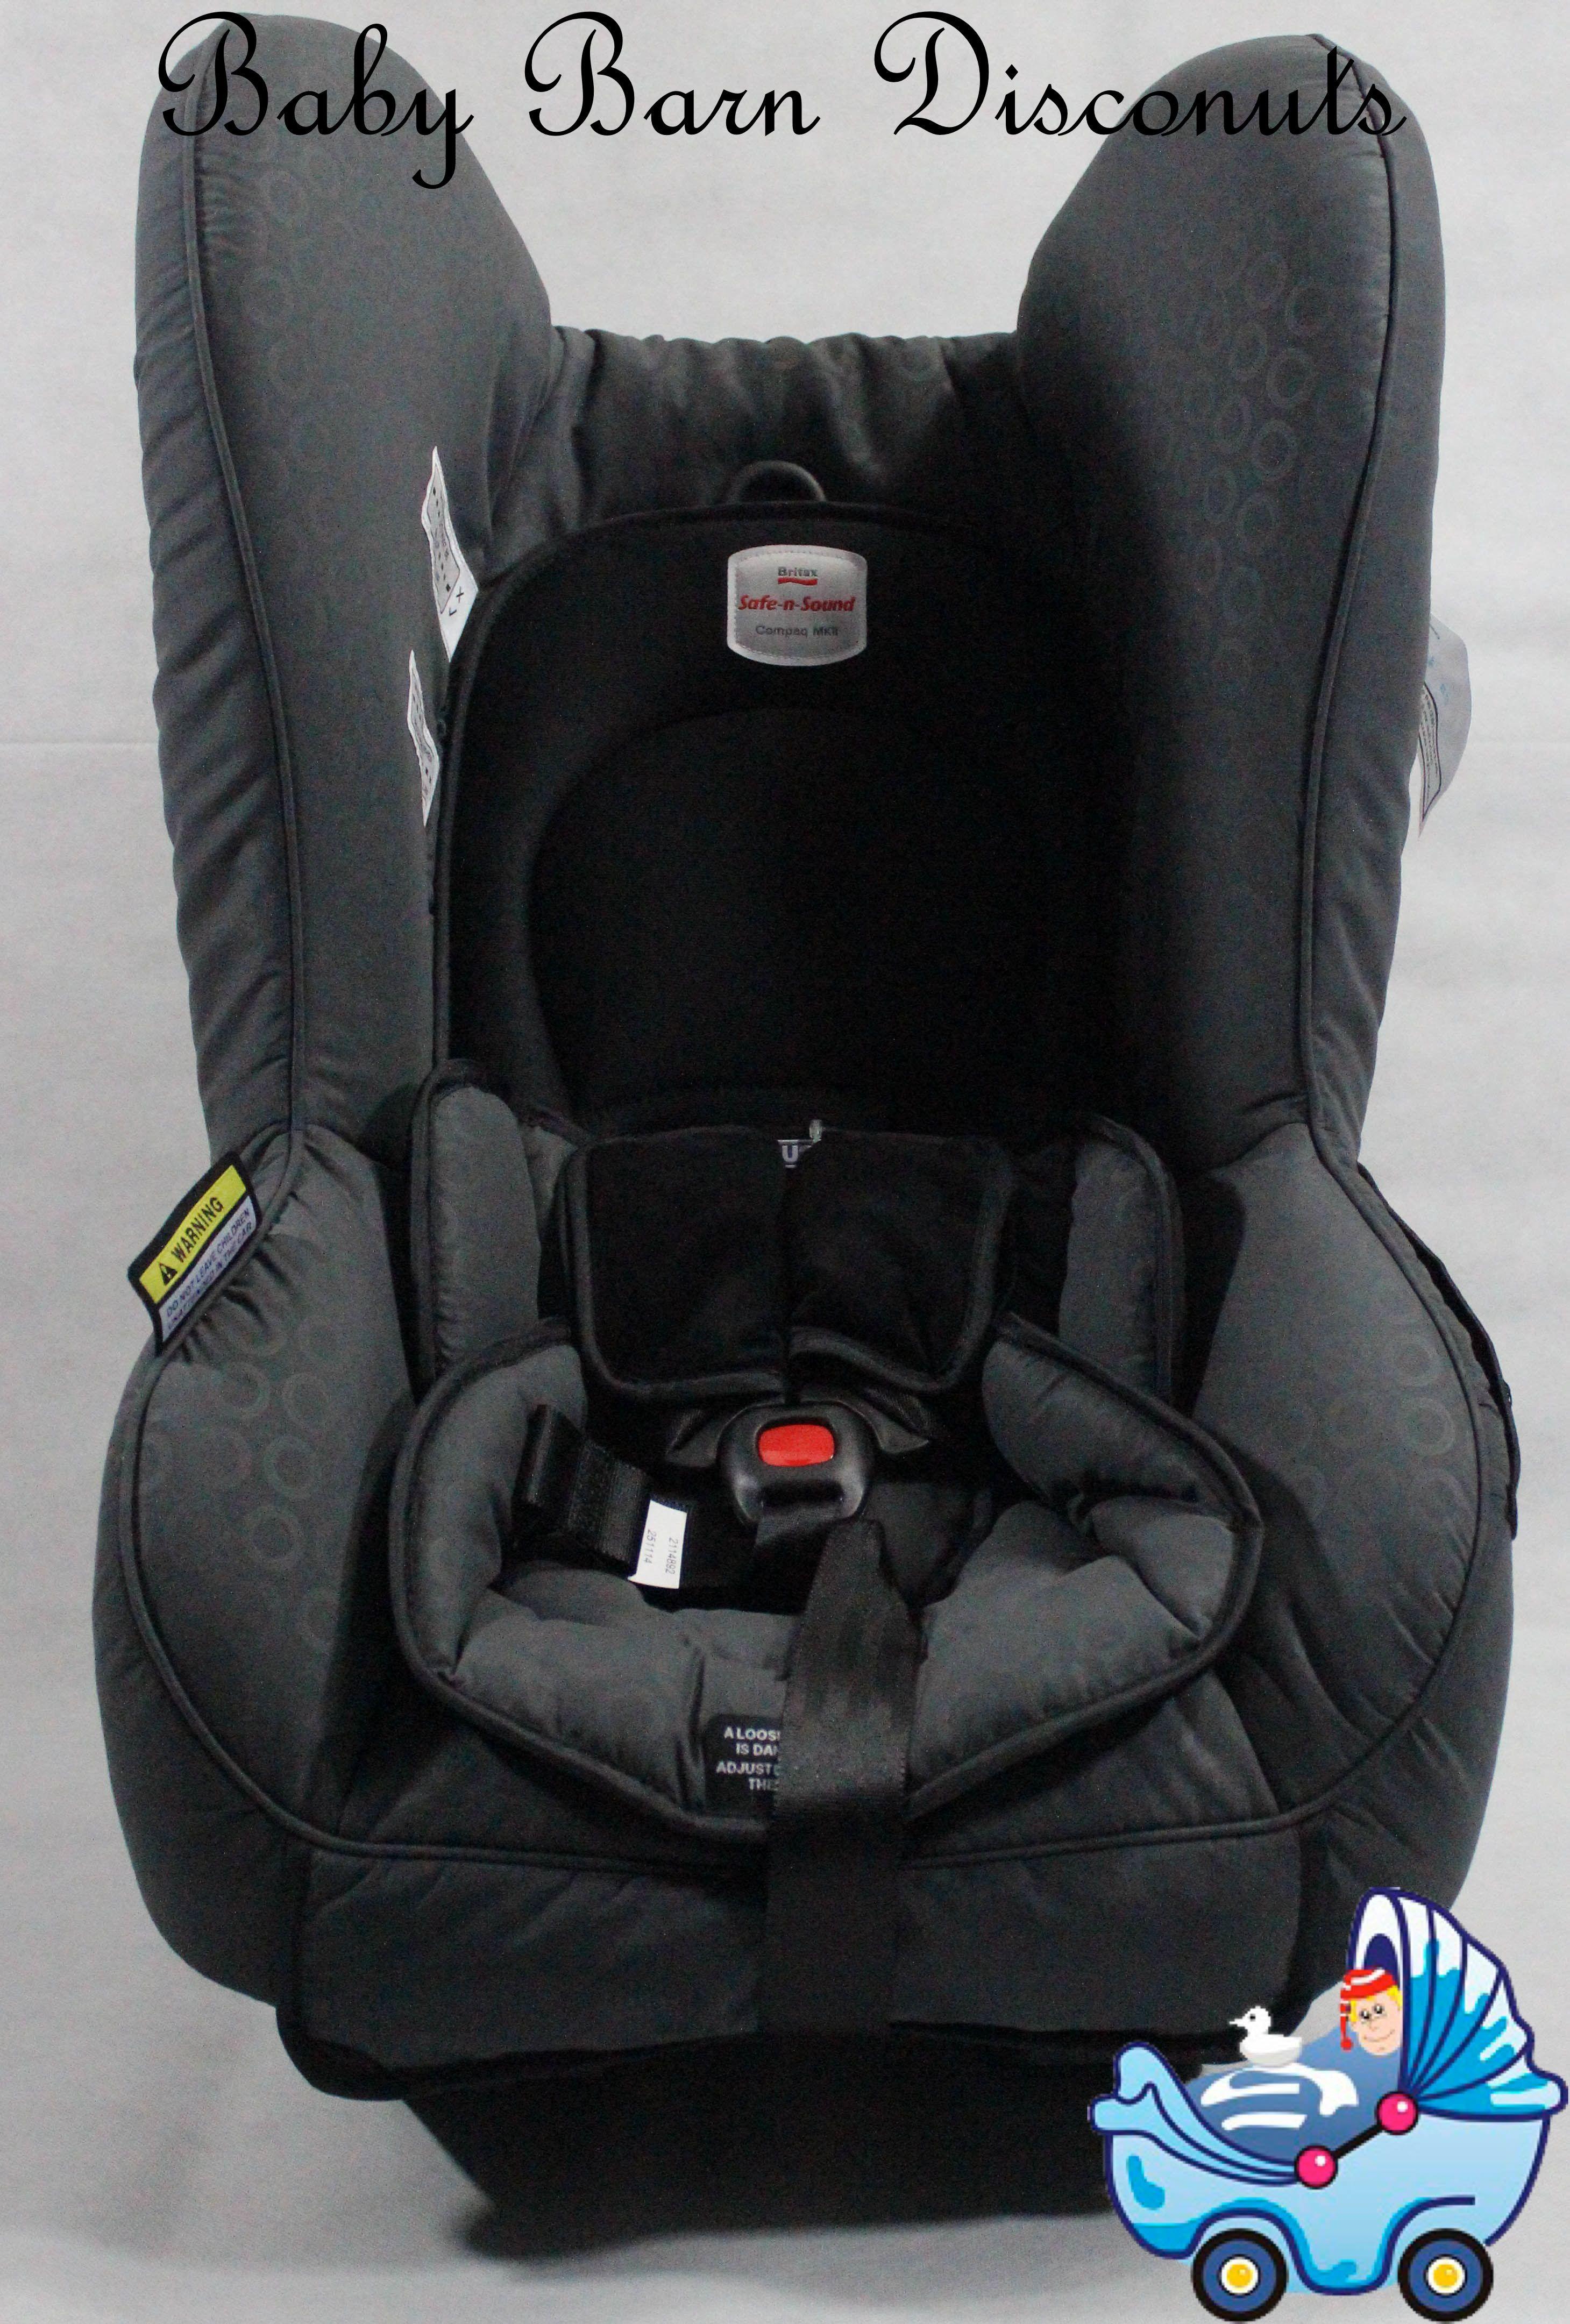 241dc72d2 Safe n Sound - Compaq MKII Convertible Car Seat